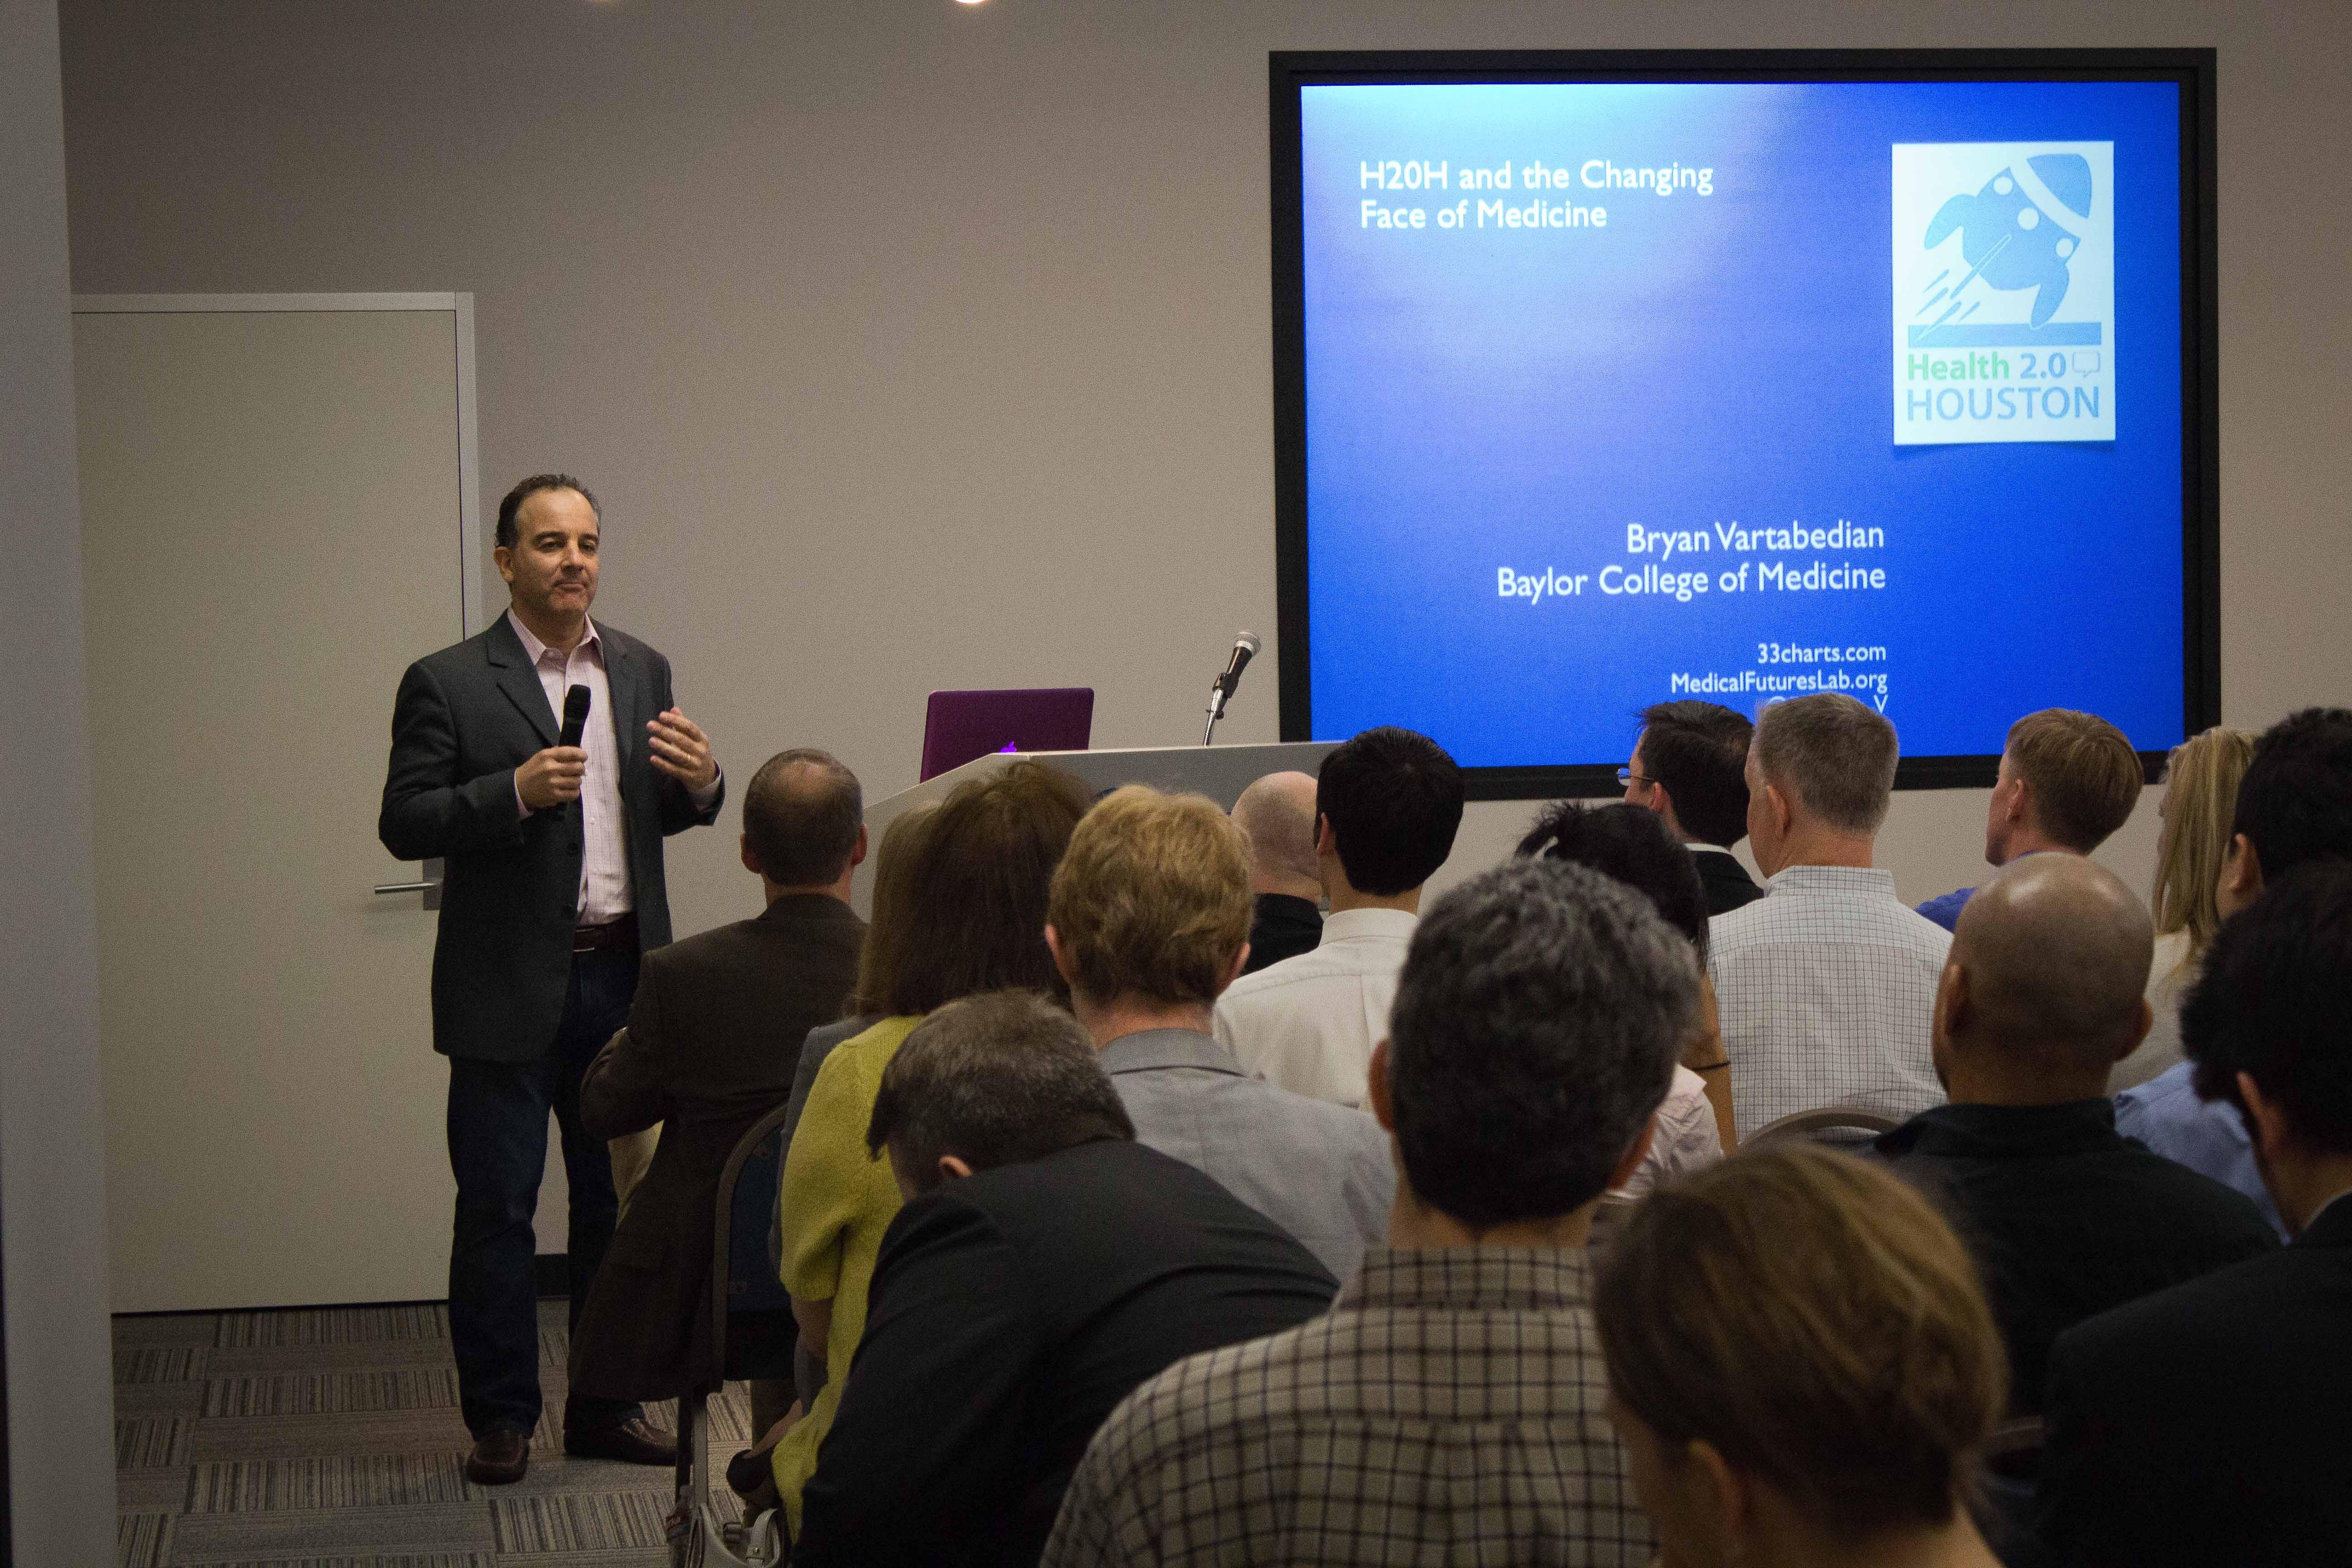 Health 20 Houston Launch at Houston Technology Center